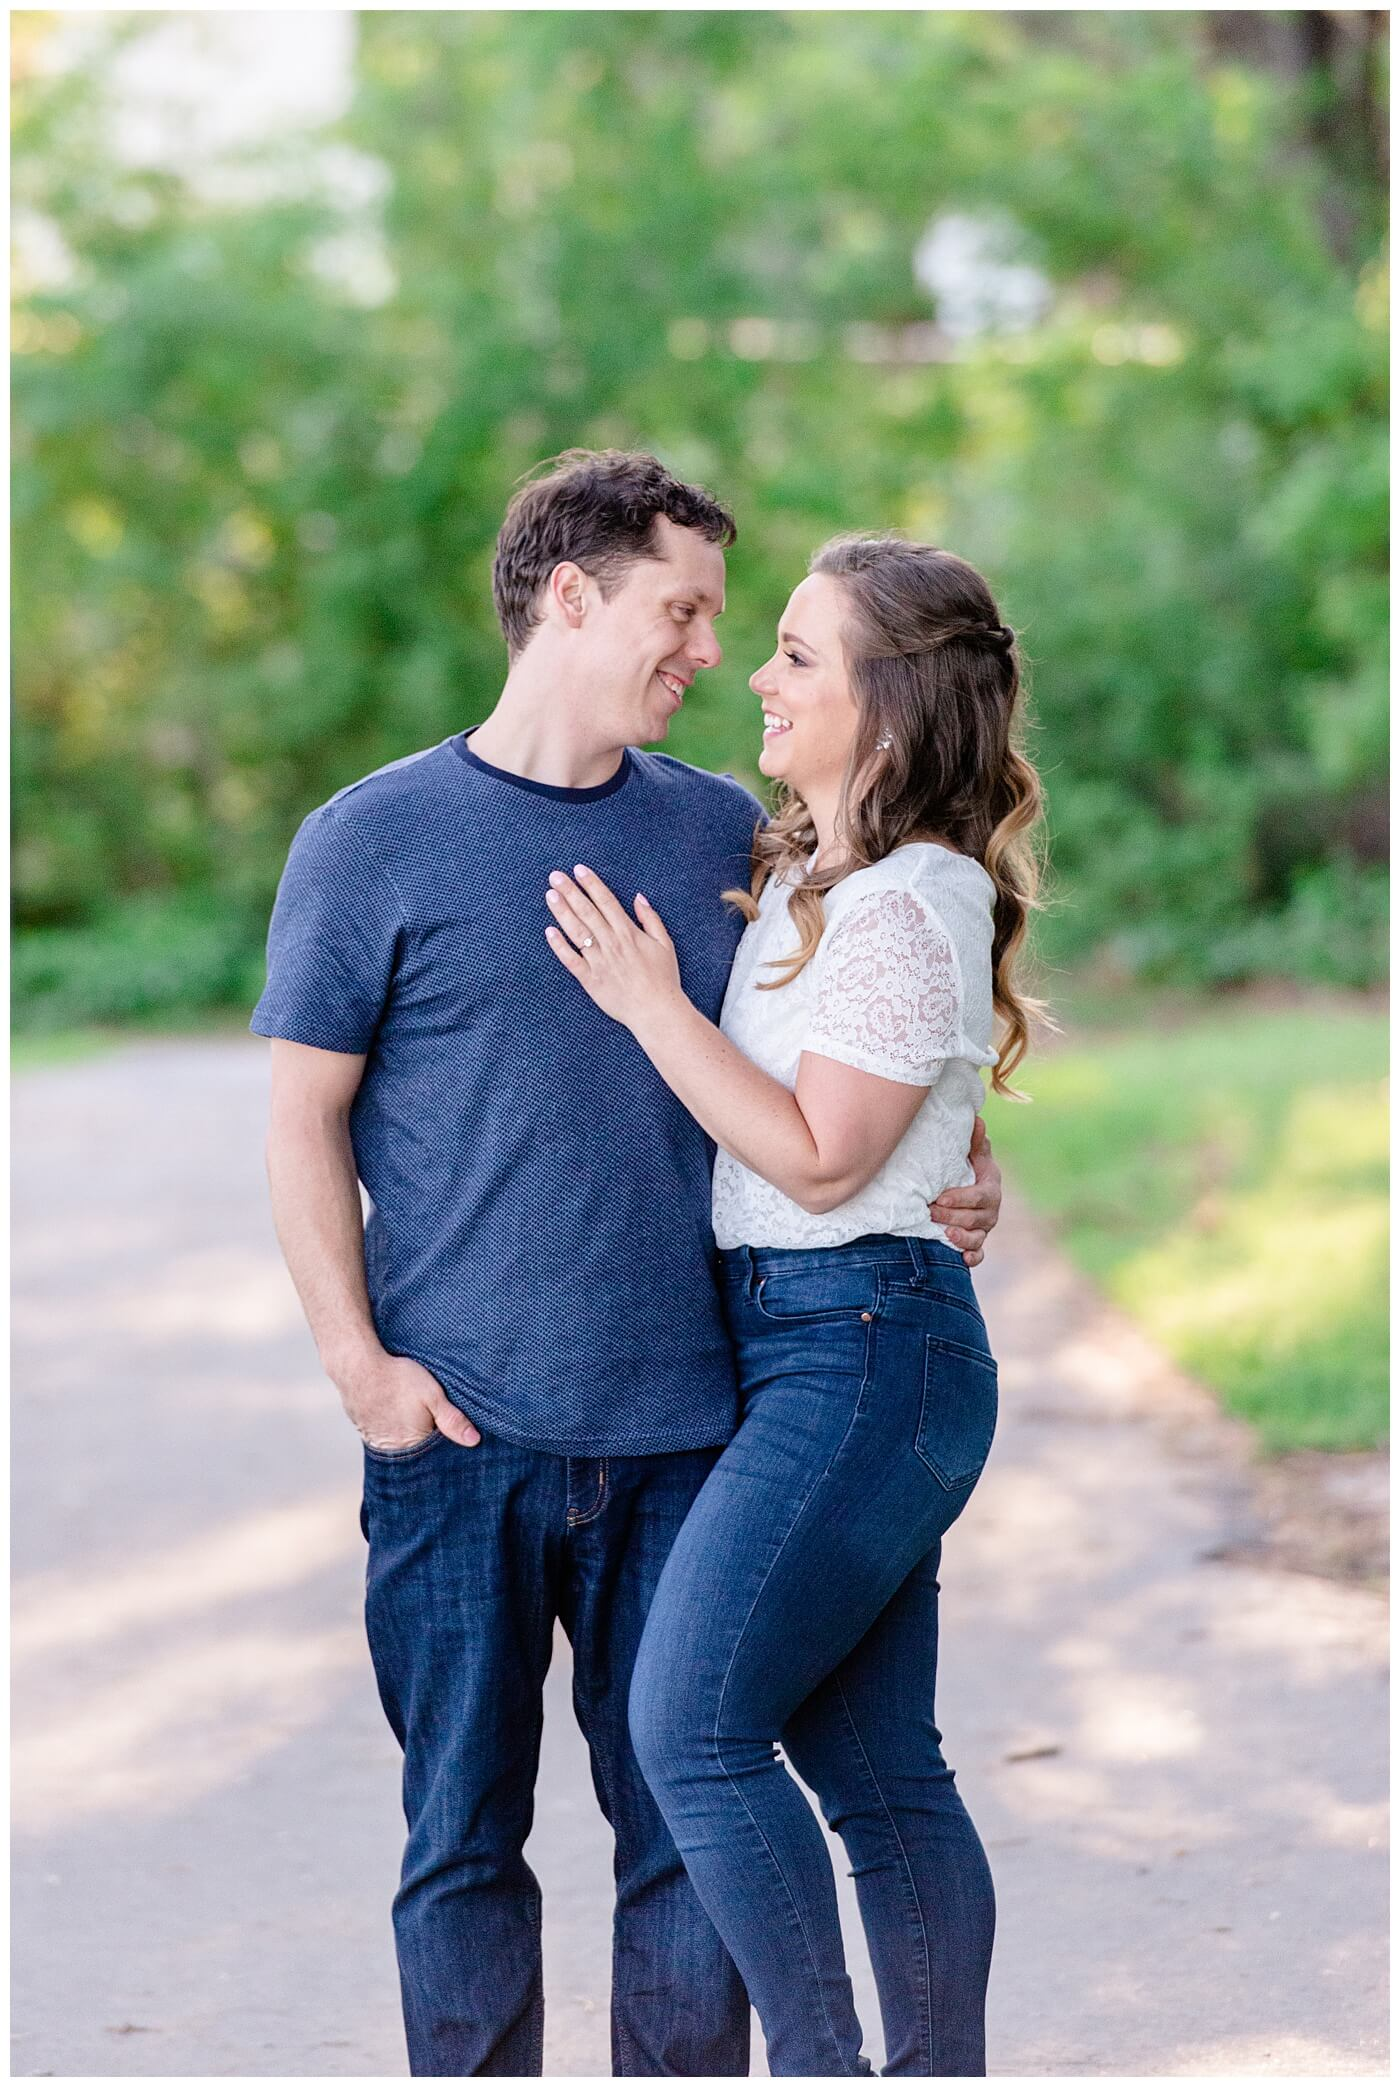 Regina Engagement Photographers - Adam - Sarah - Natural Light Engagement Session in Wascana Park - Couple in Wascana Park